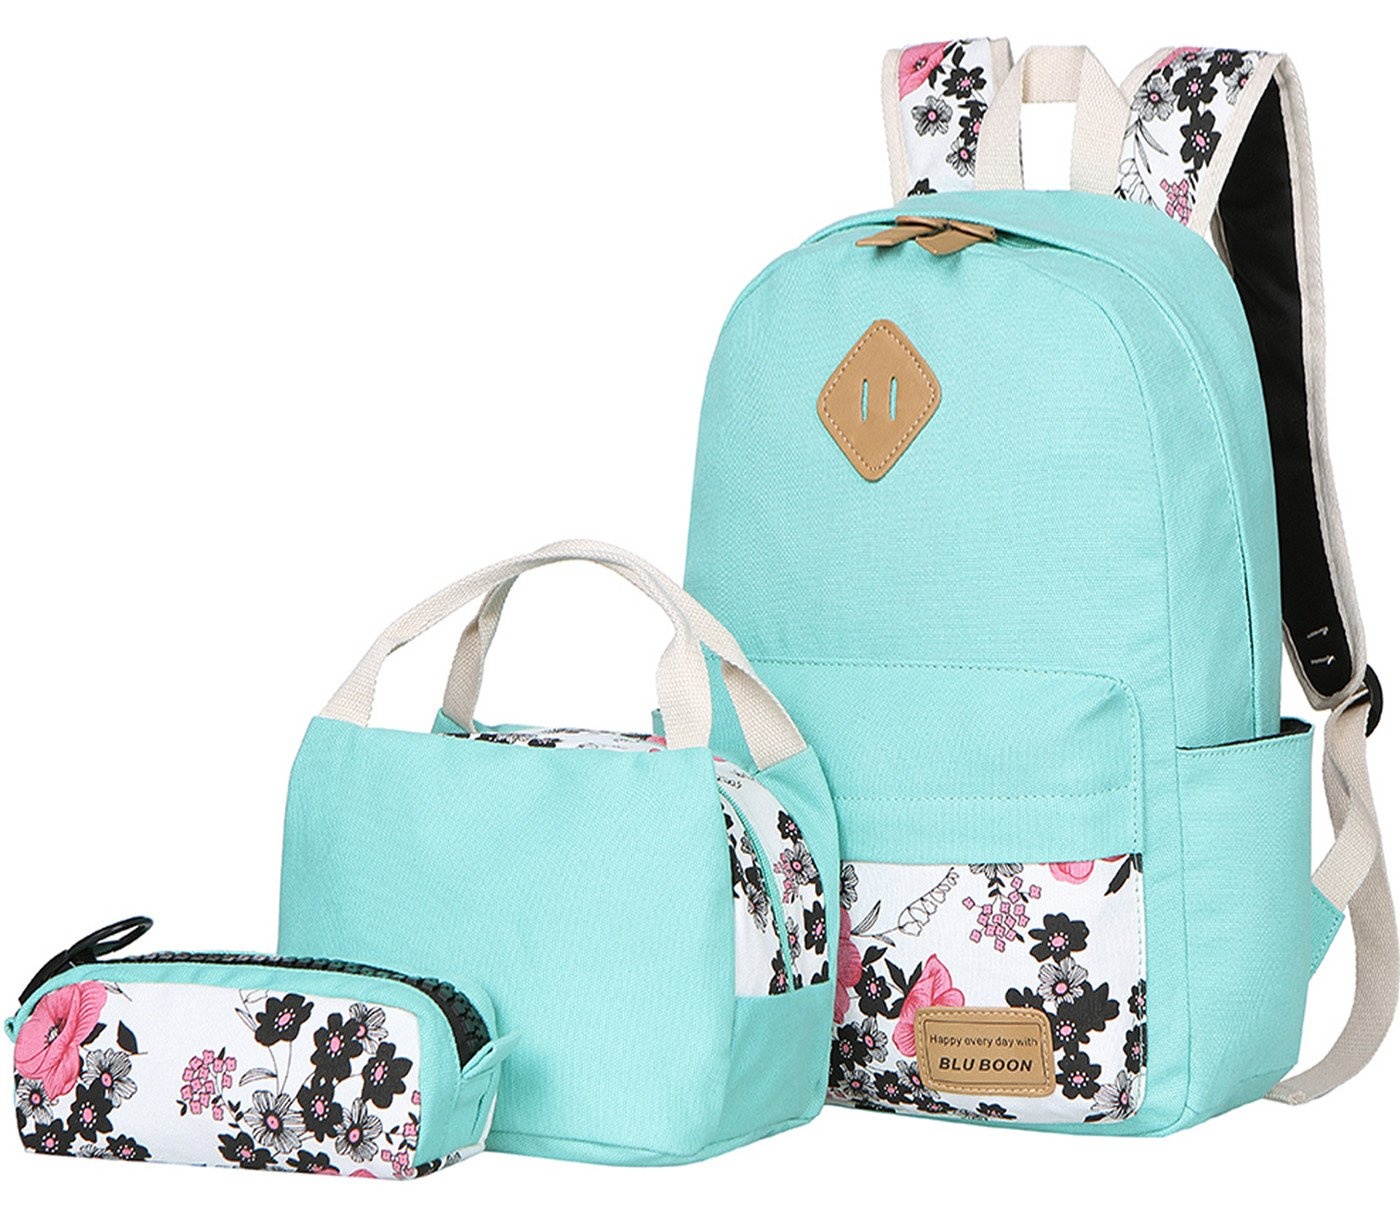 BLUBOON Teens Backpack Set Canvas Girls School Bags, Bookbags 3 in 1 (Water Blue-14)